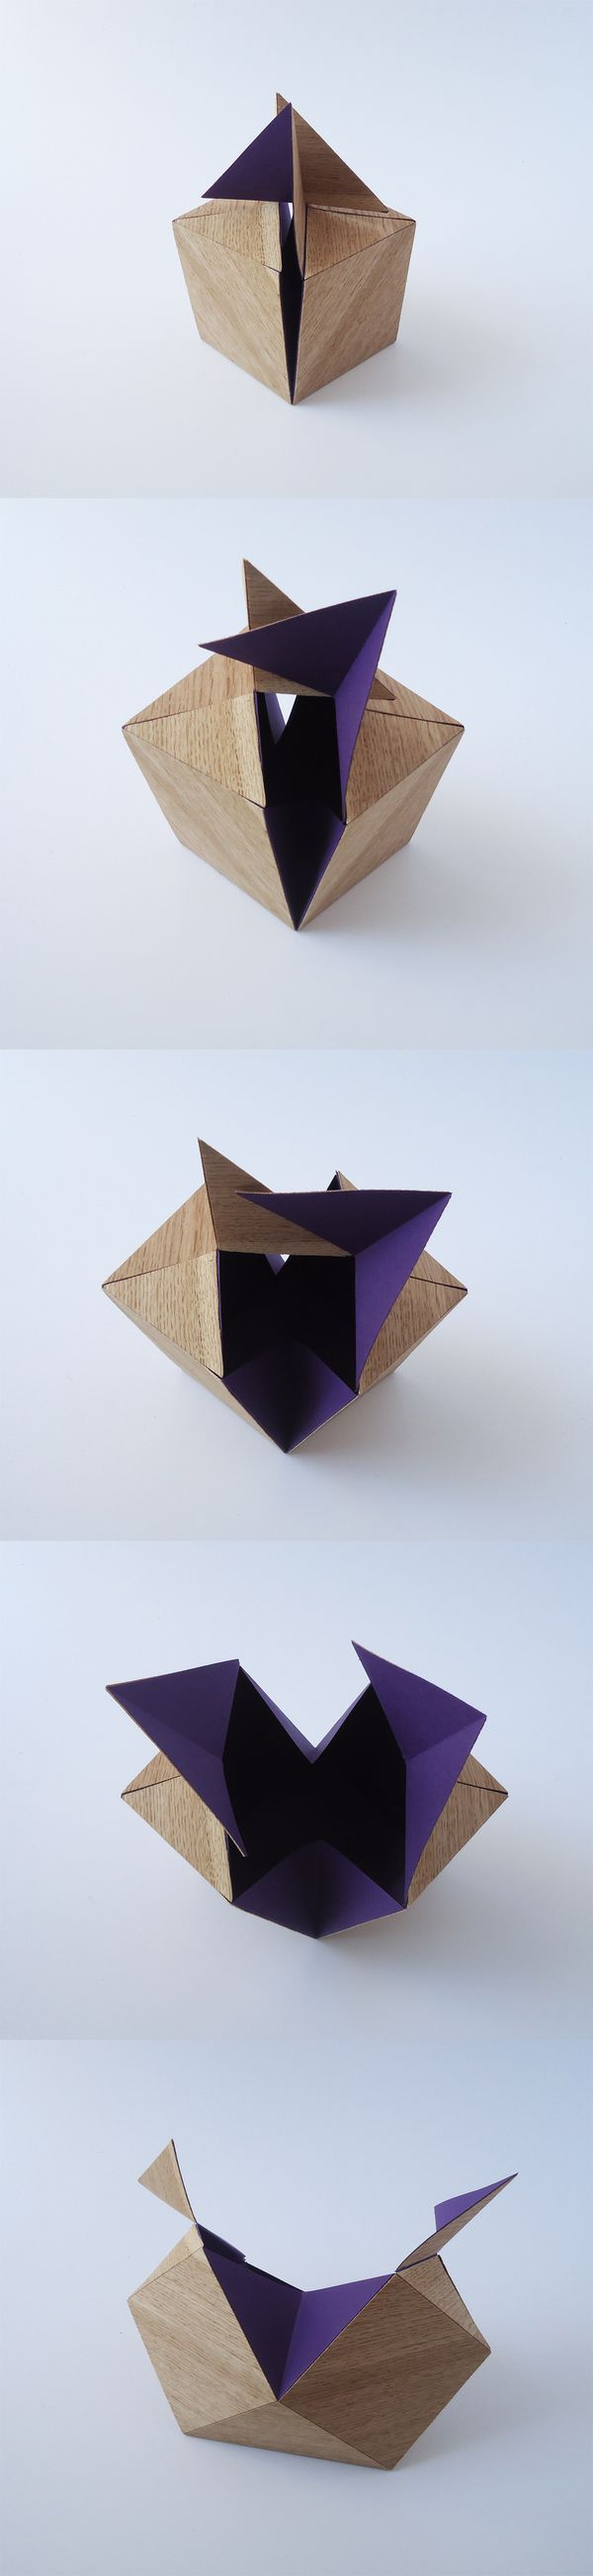 Pandoras box wallpaper image featuring english sculpture - Pandora Box Veneer By Wiktoria Szawiel Via Behance